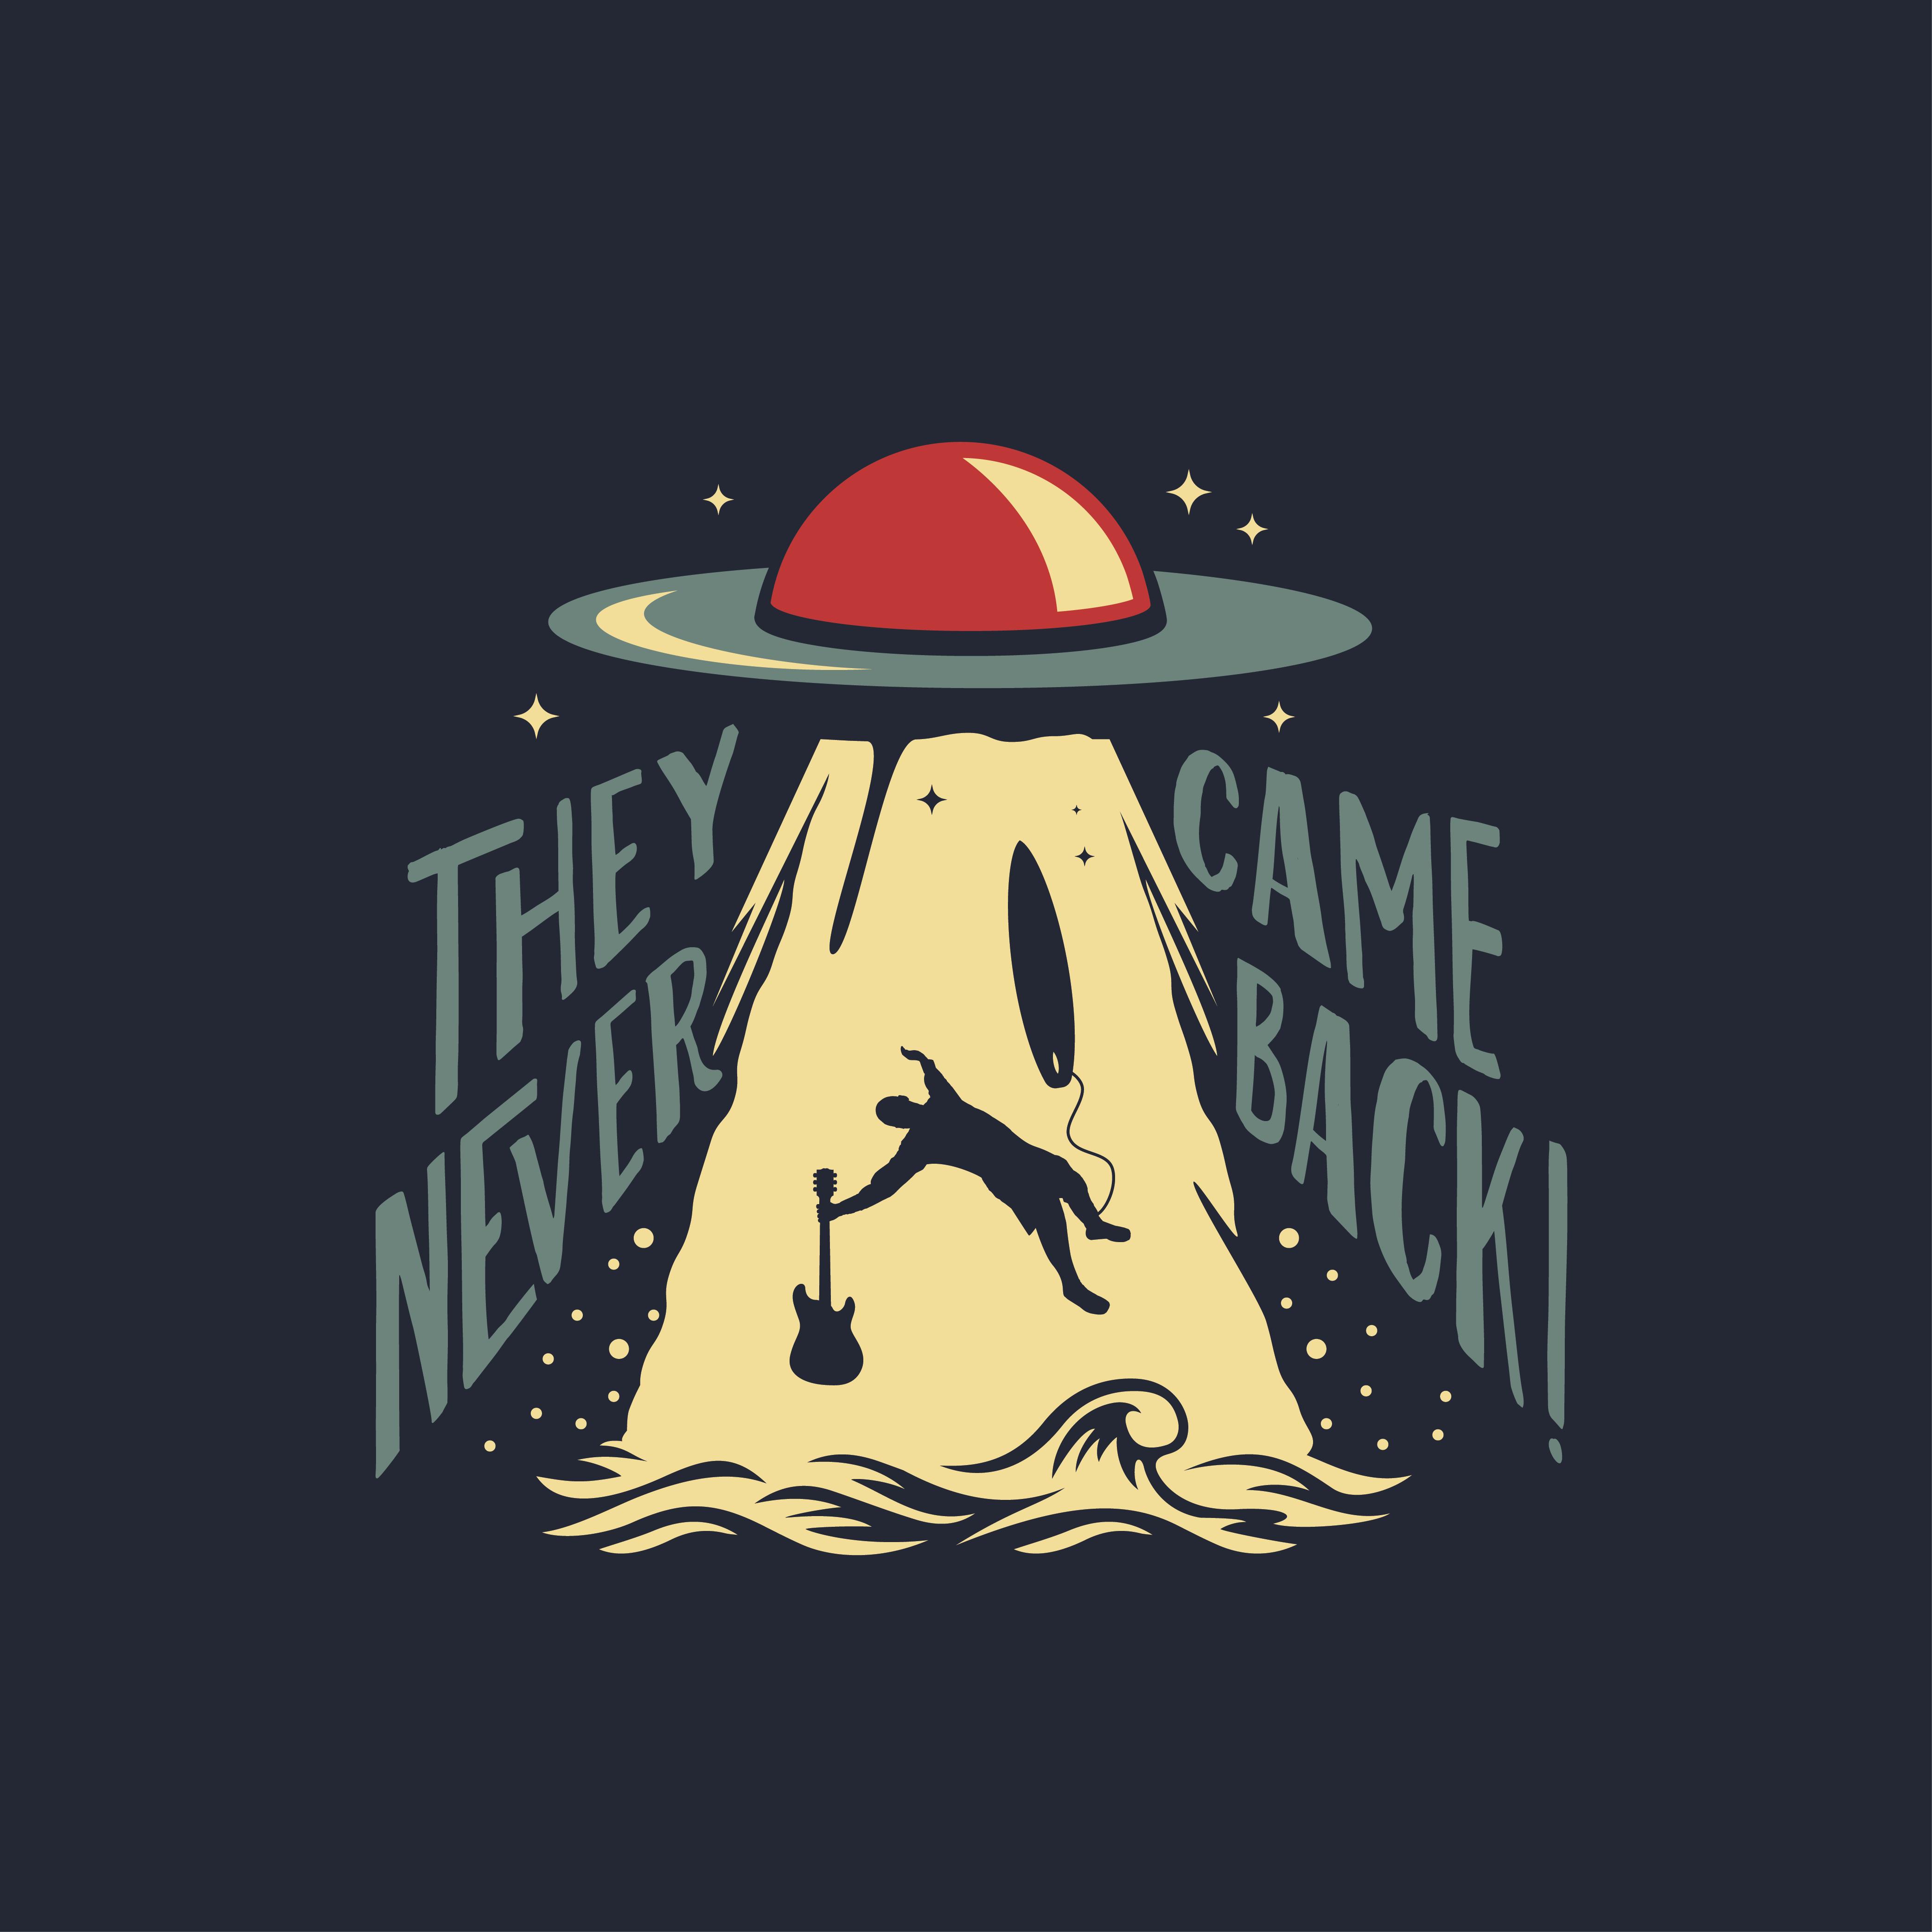 Surf band logo with a sci-fi twist